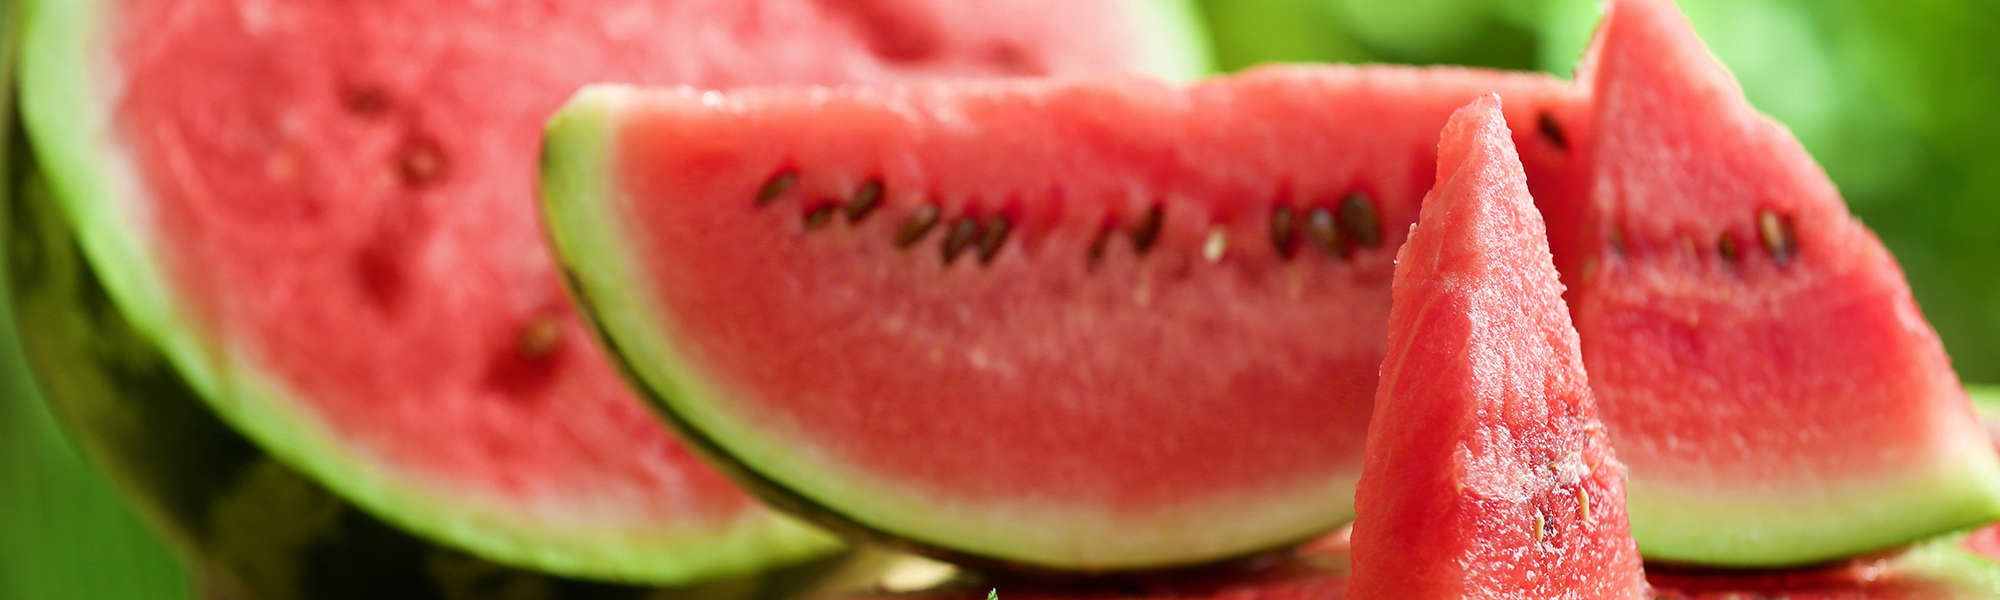 The Many Health Benefits of Watermelon